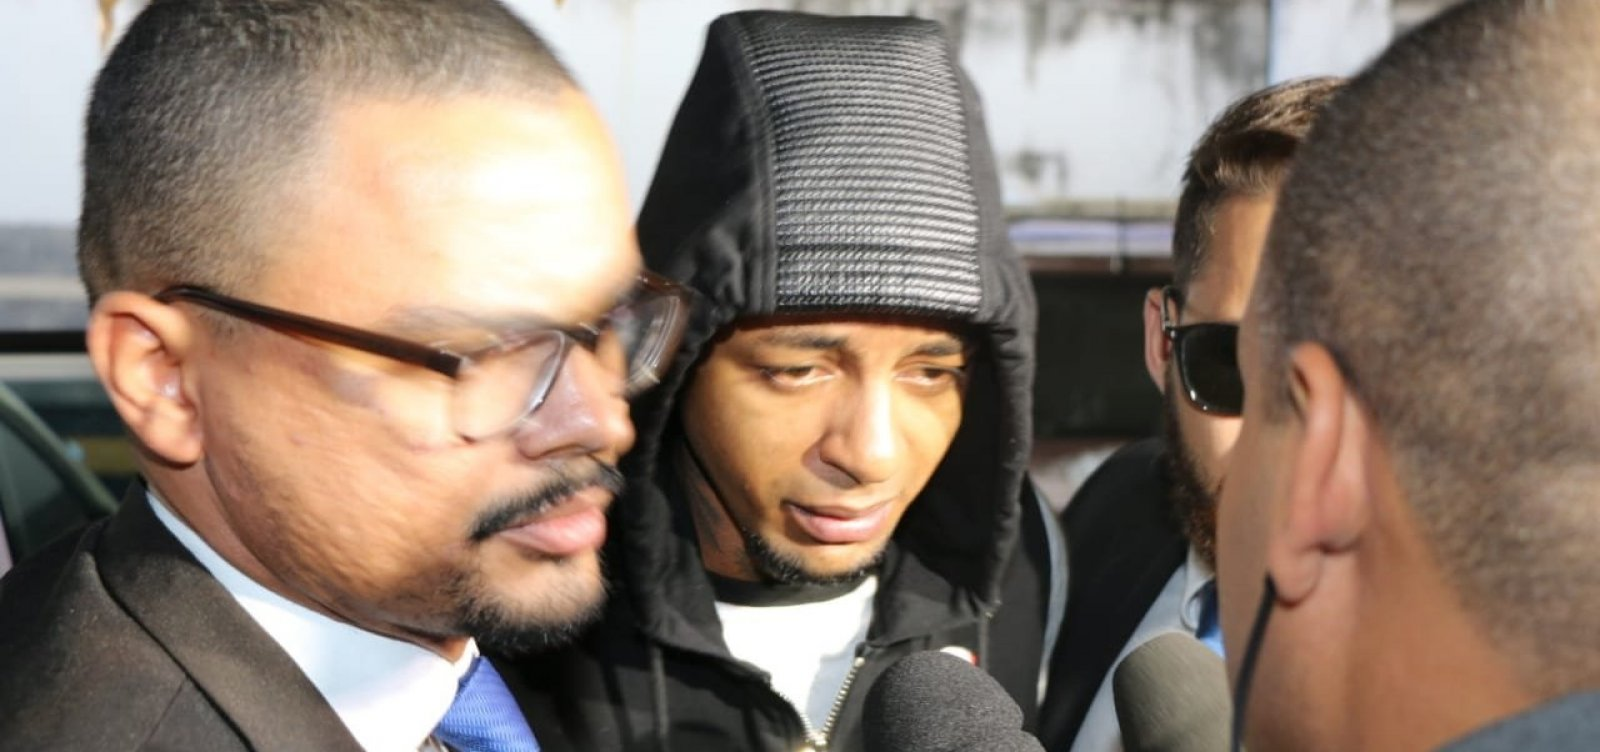 [MP aponta que Iuri Sheik chutou corpo de vítima após disparos]